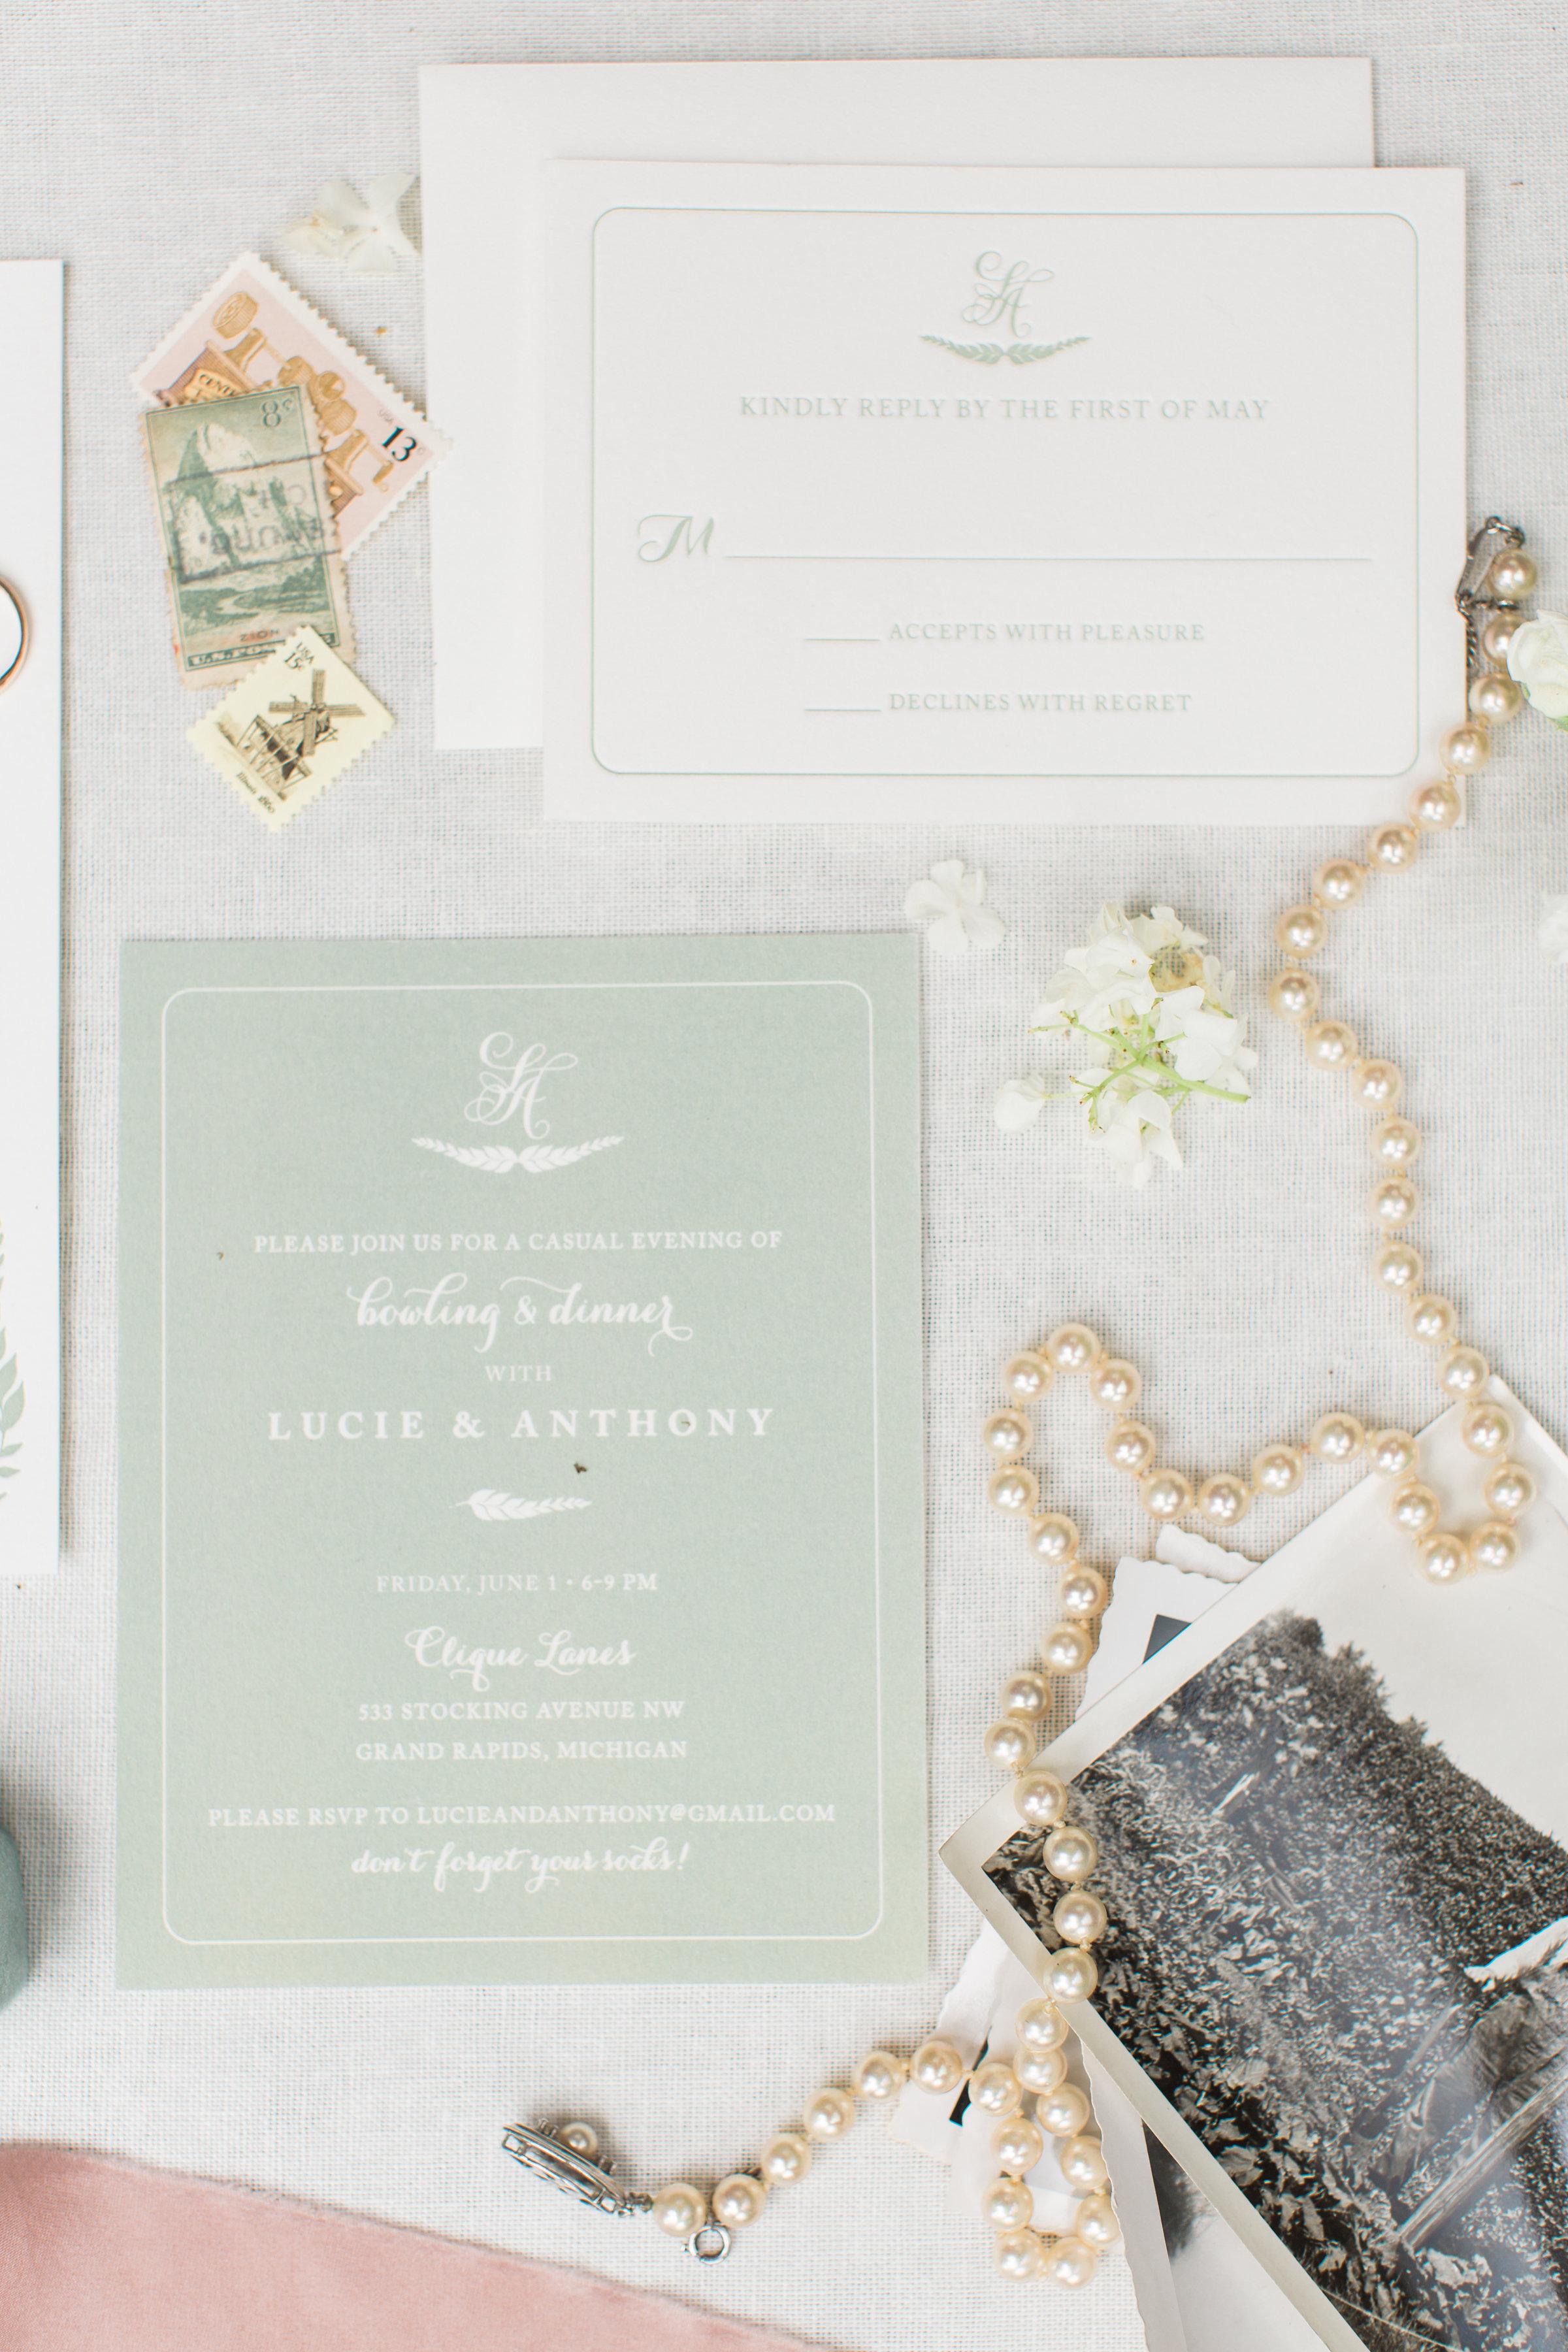 Julius+Wedding+Details-8.jpg